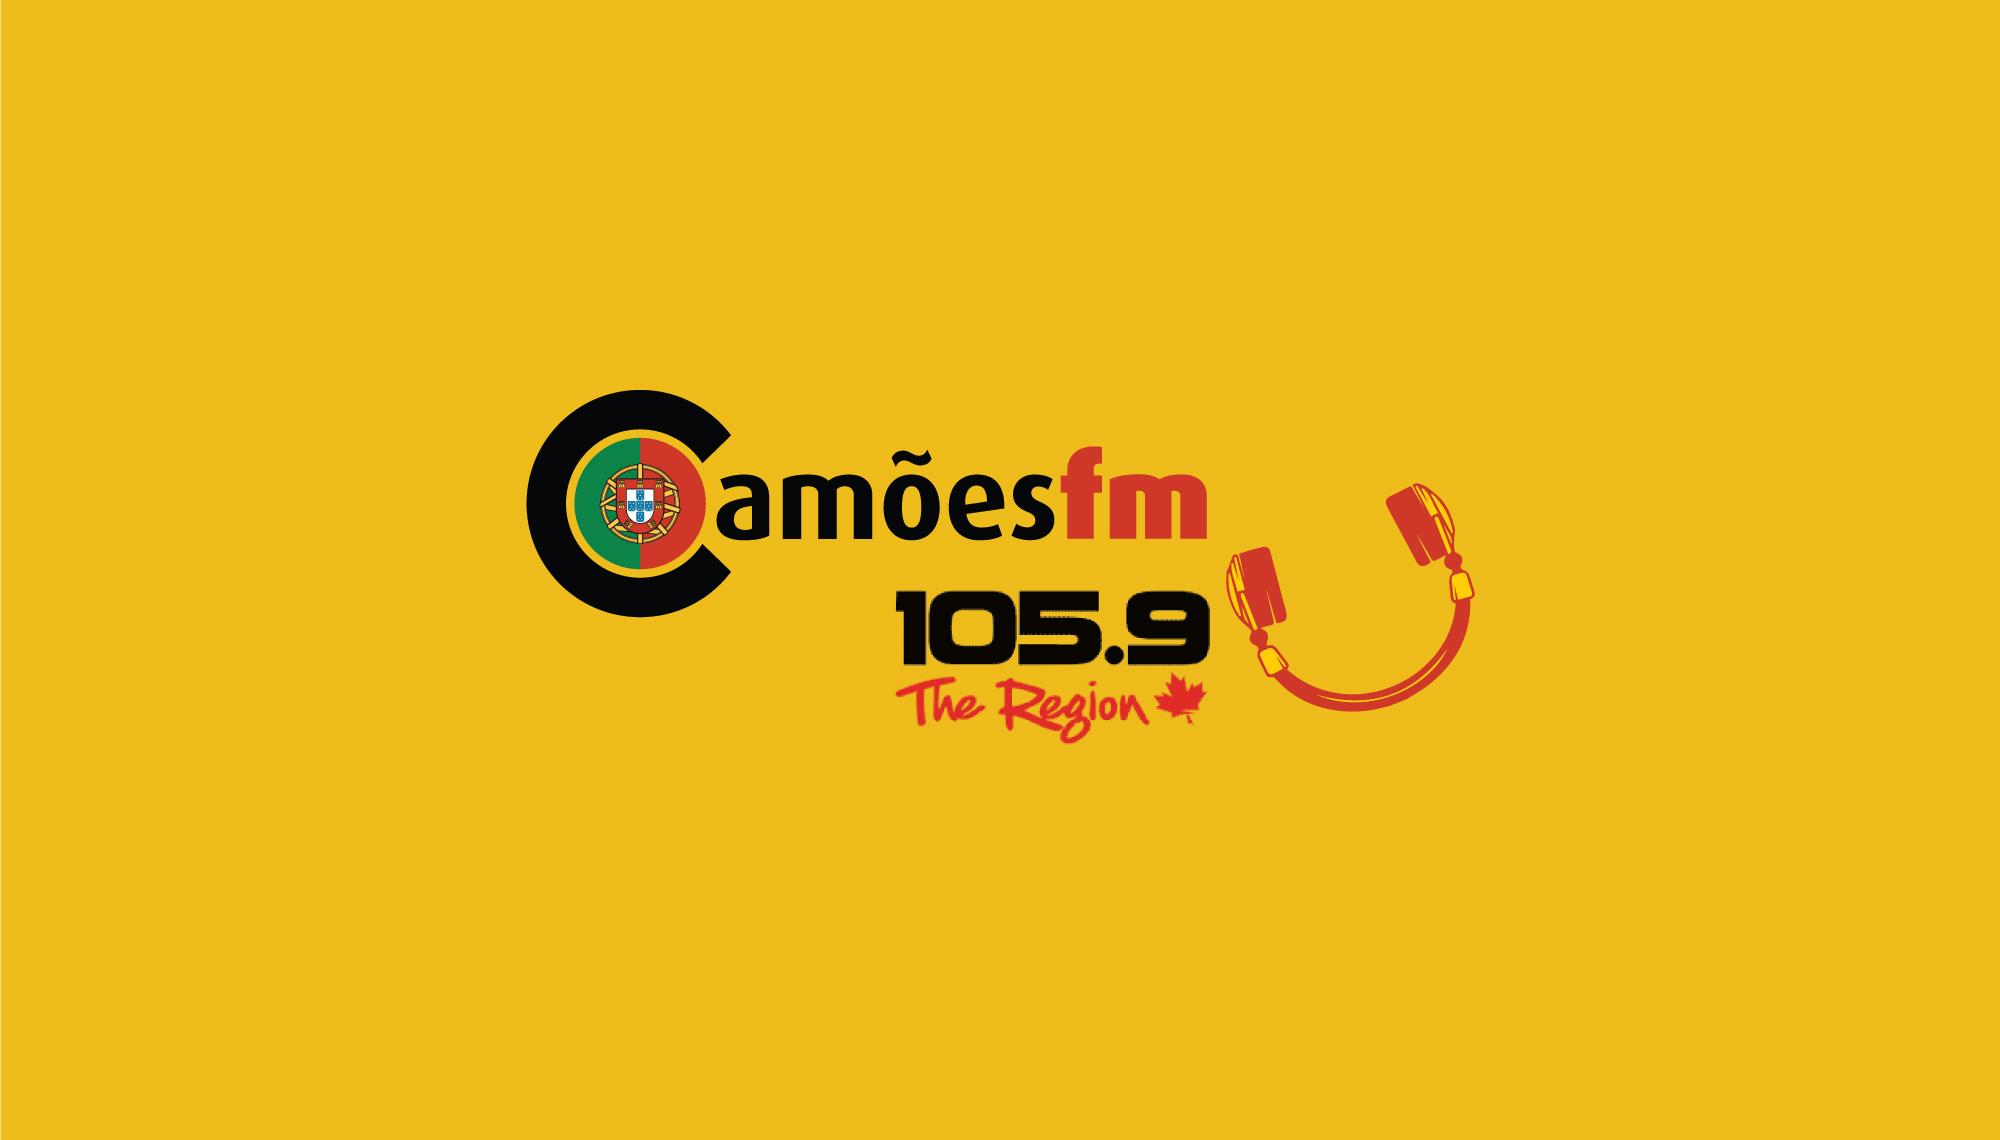 CamoesFM